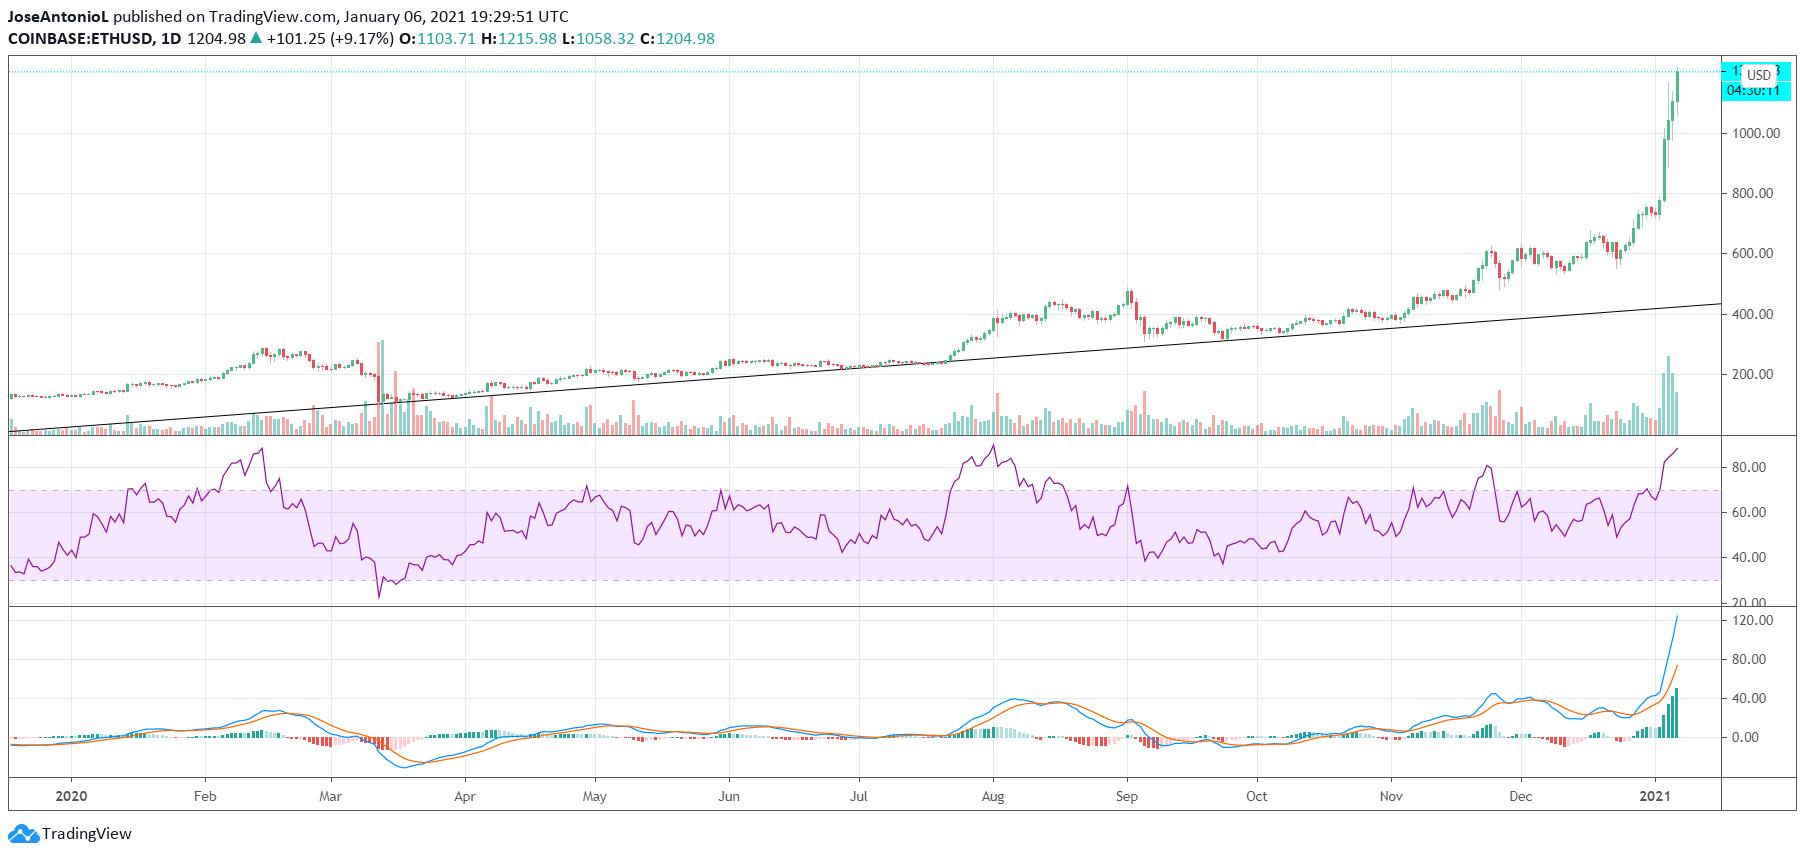 Price of Ethereum Since 2020. Image: Tradingview